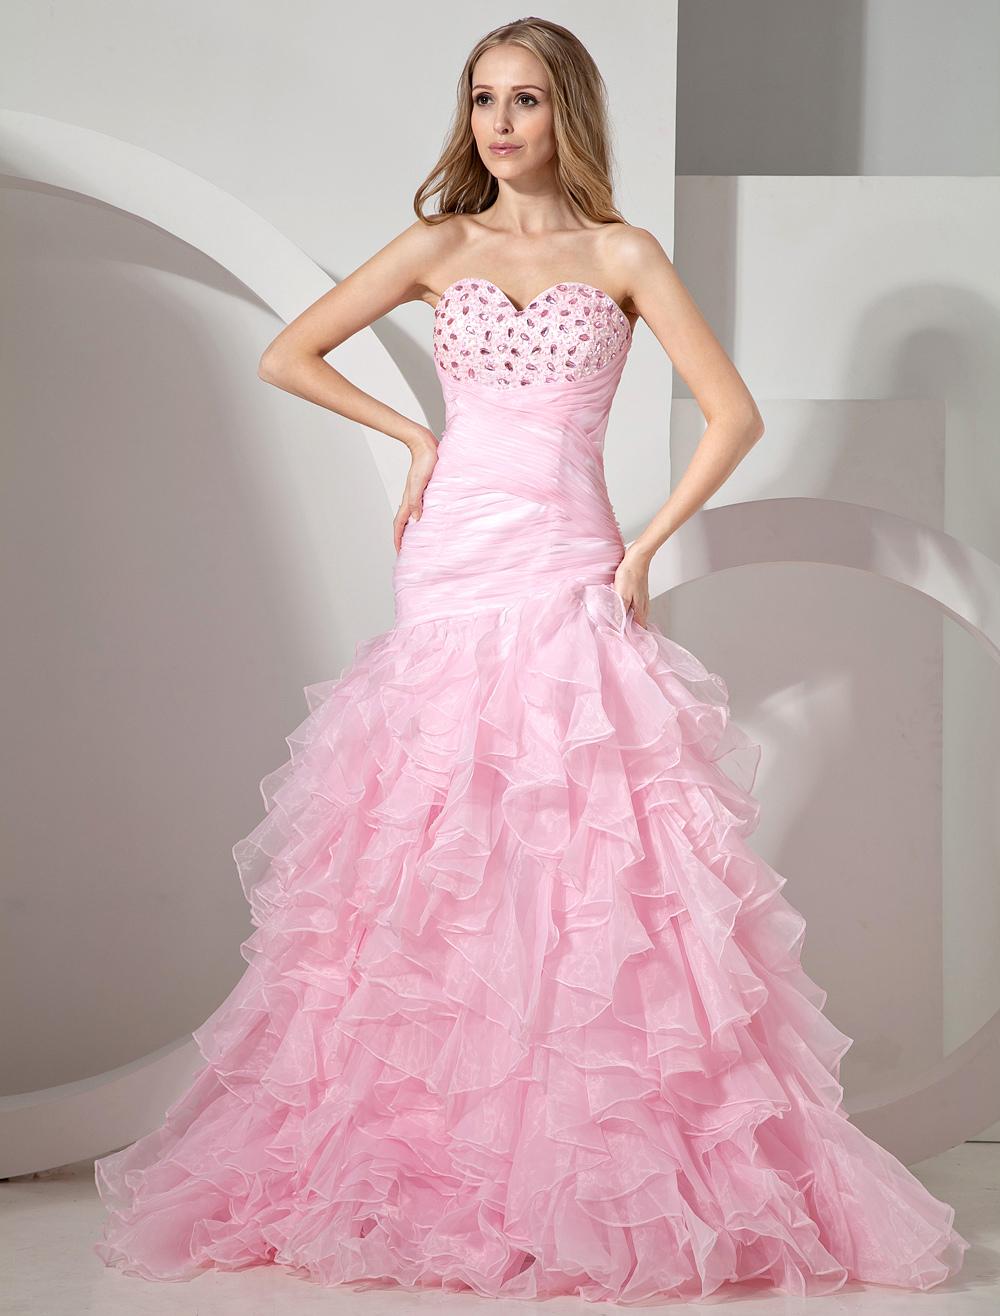 Pink Strapless Ruffles Organza Woman's Prom Dress (Wedding Prom Dresses) photo